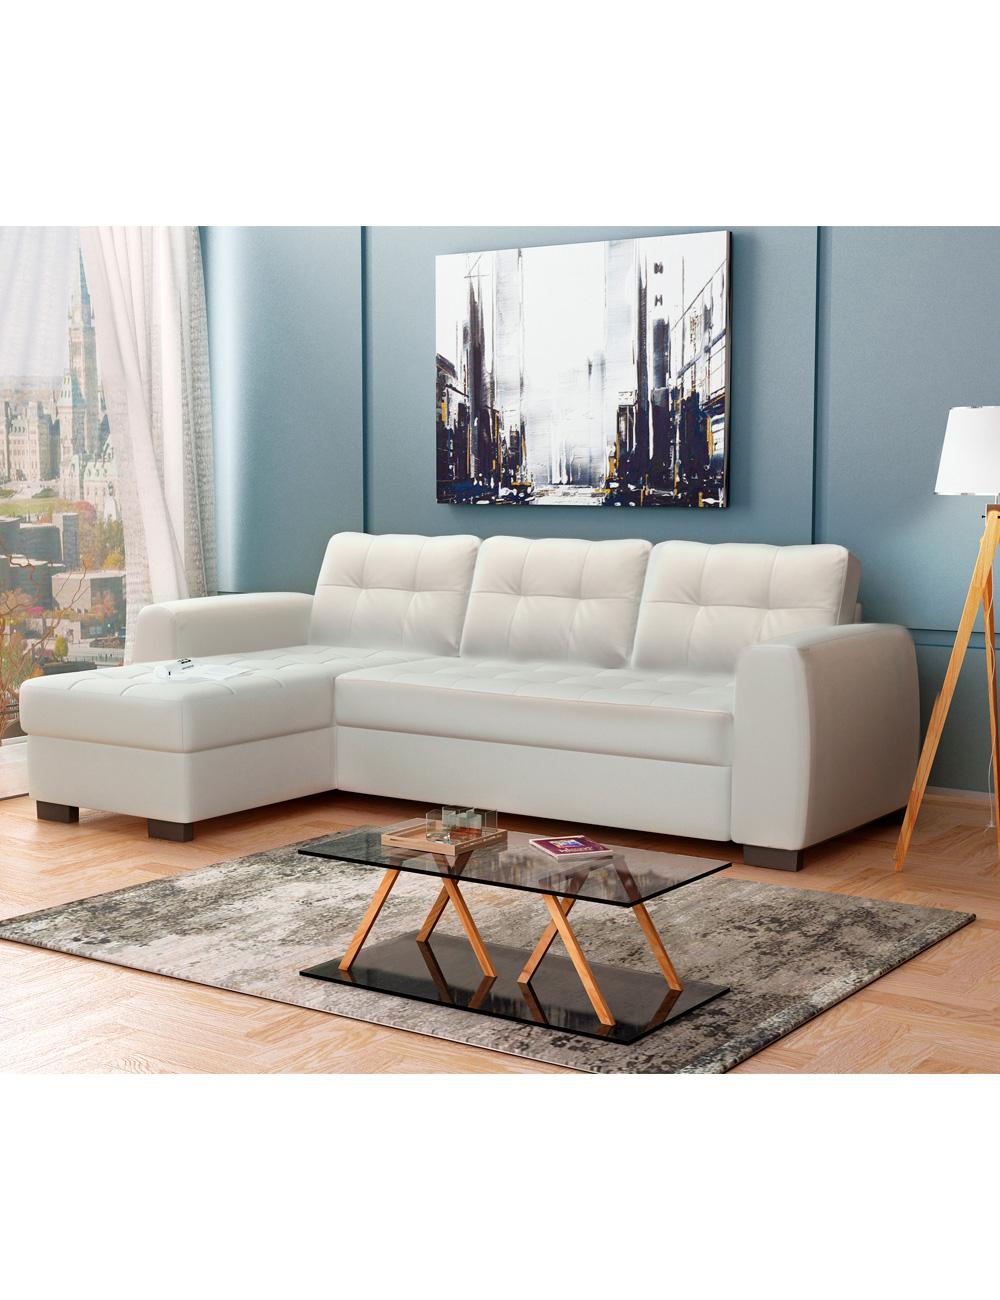 canap lit d 39 angle donna blanc. Black Bedroom Furniture Sets. Home Design Ideas